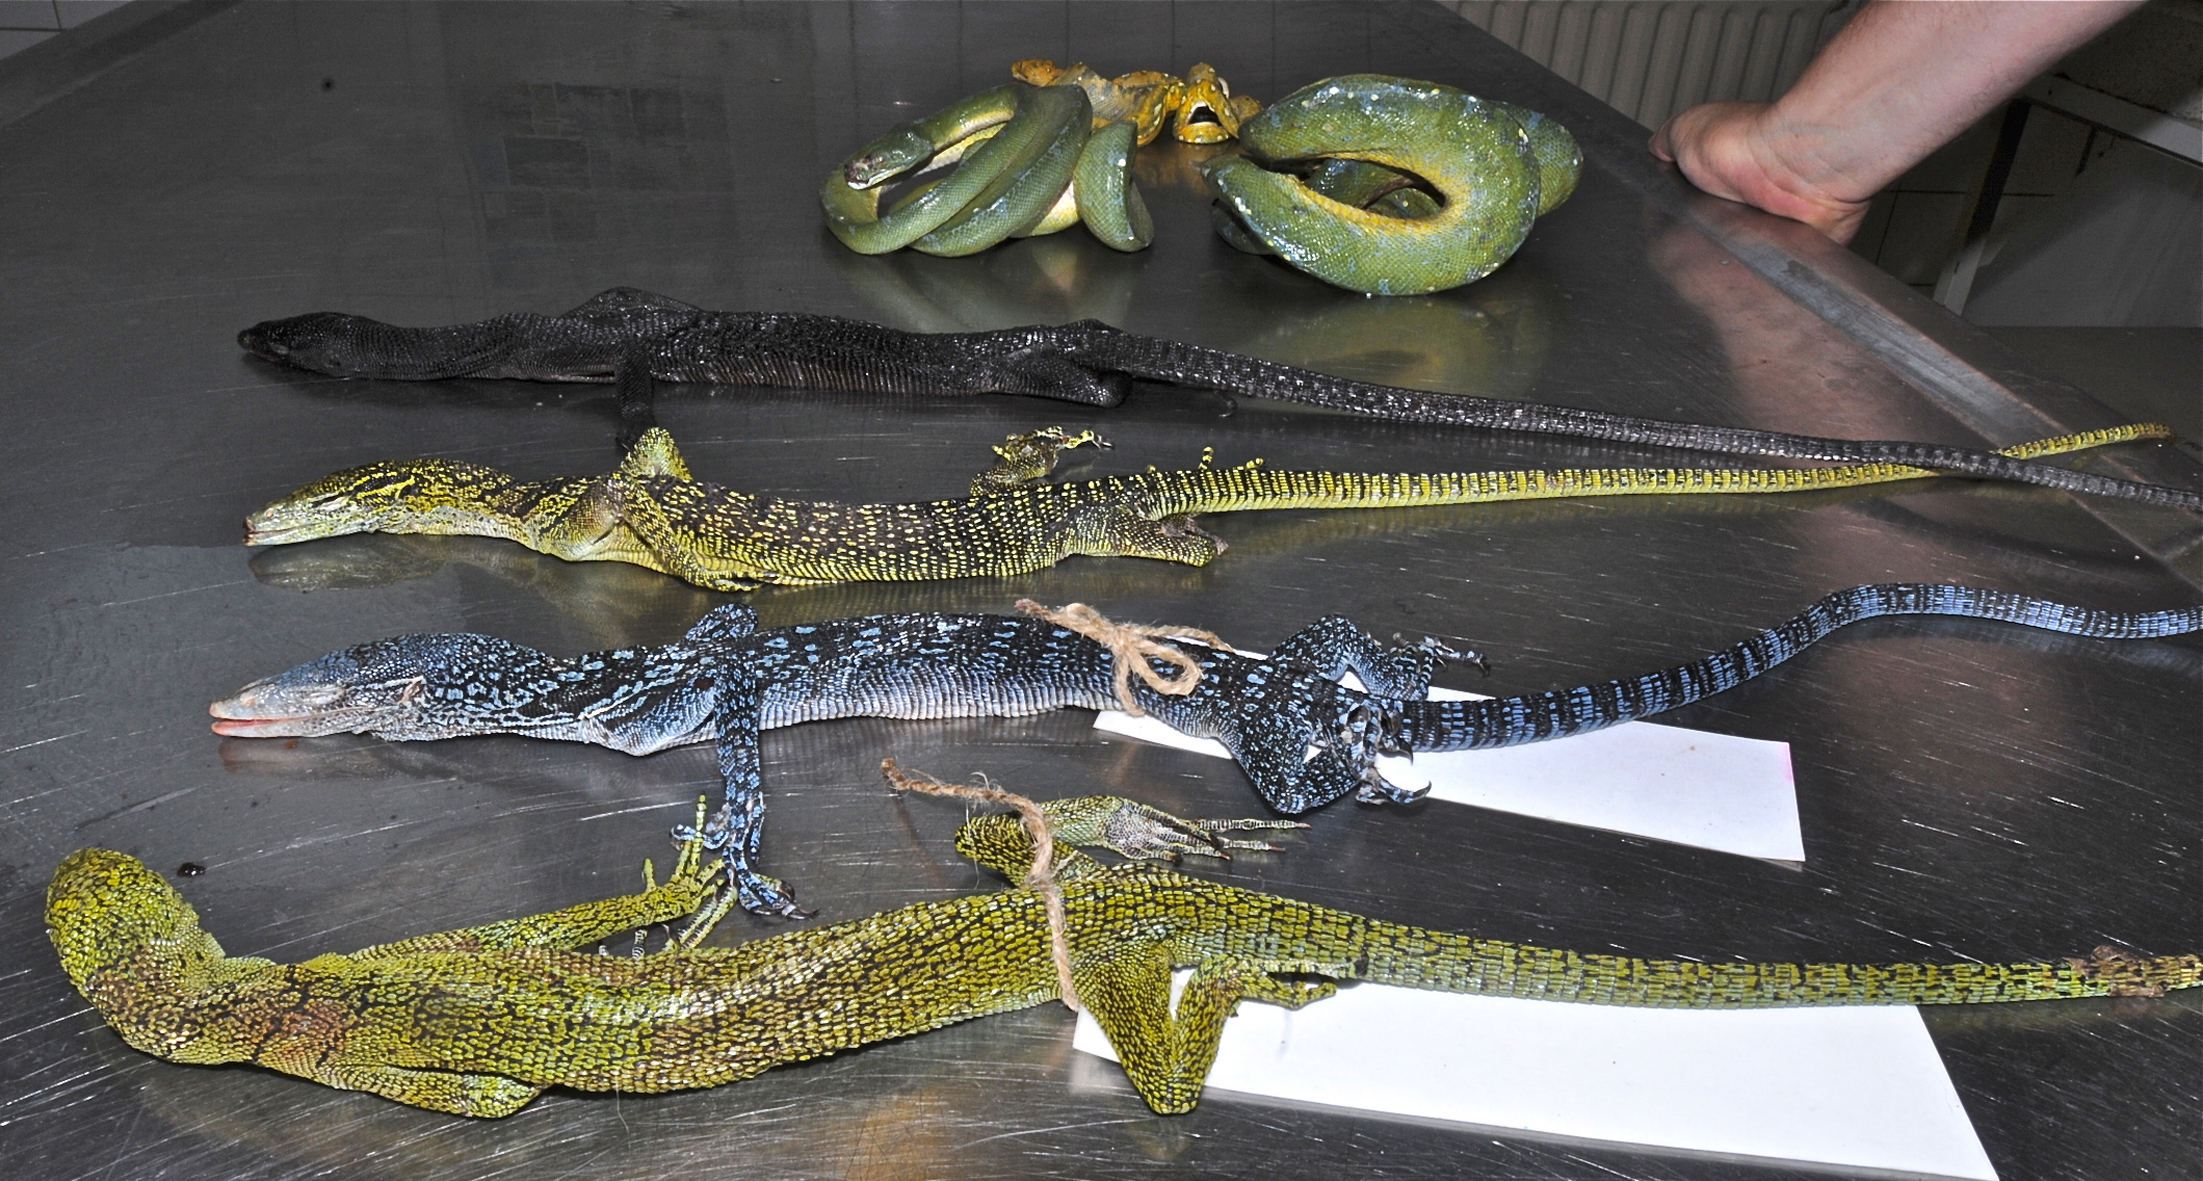 pet-trade-lizards